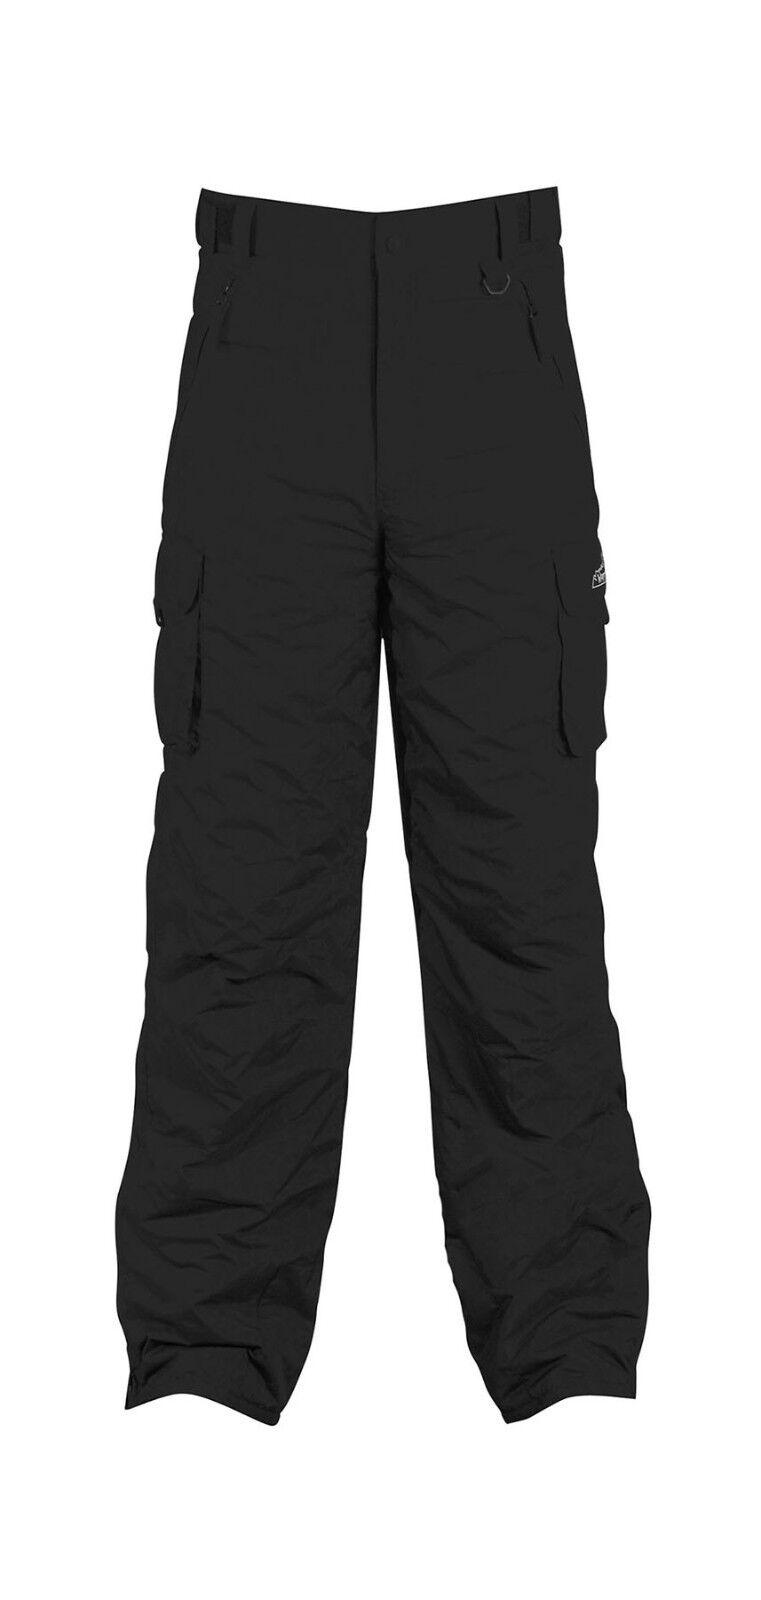 Whitestorm Youth Kids Insulated Waterproof Cargo Winter Ski Snowboard Pants